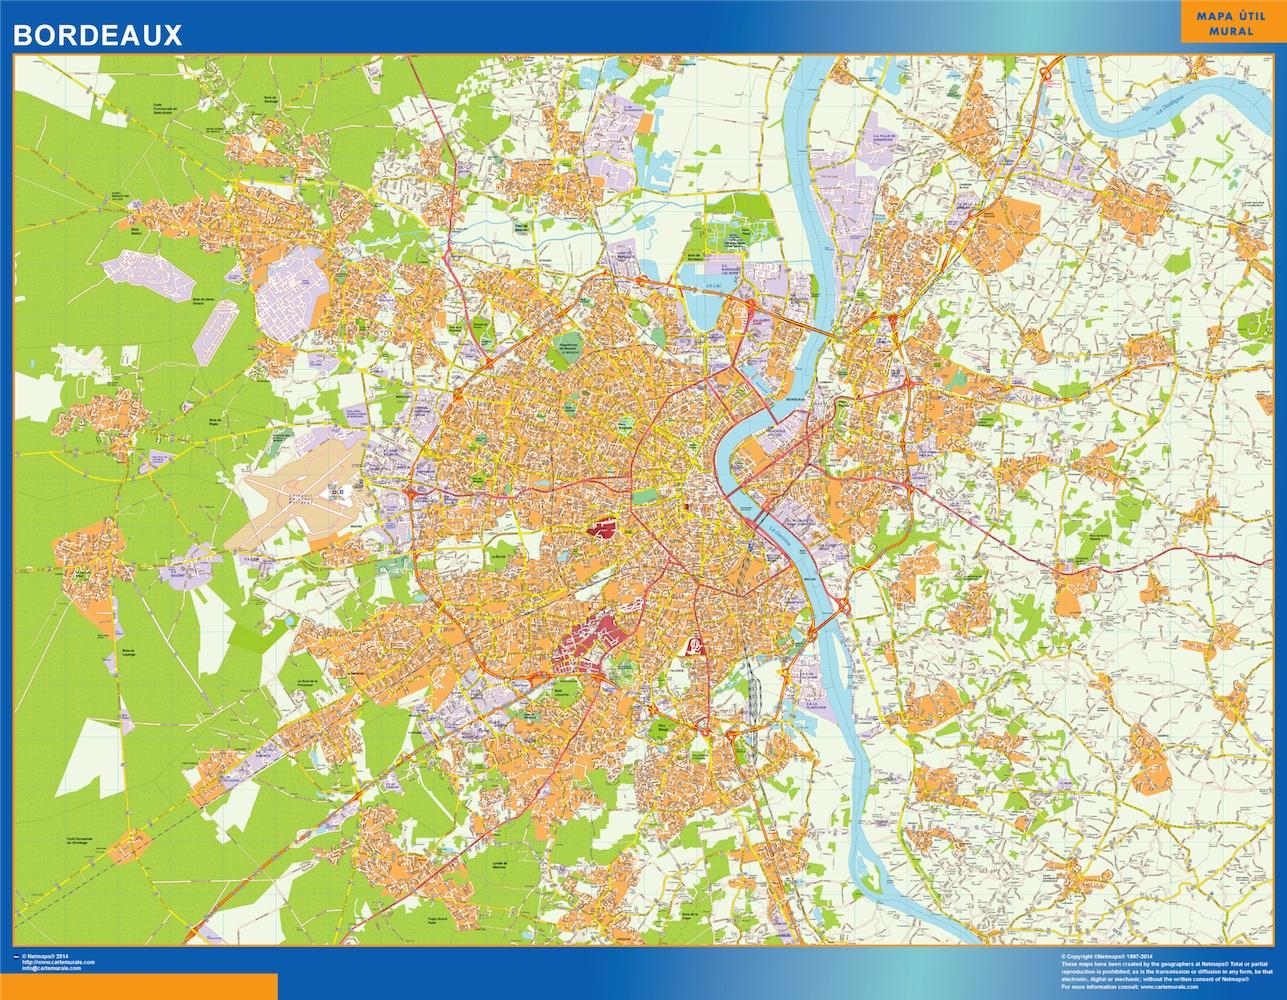 Bordeaux On Map Of France.Bordeaux Wall Map